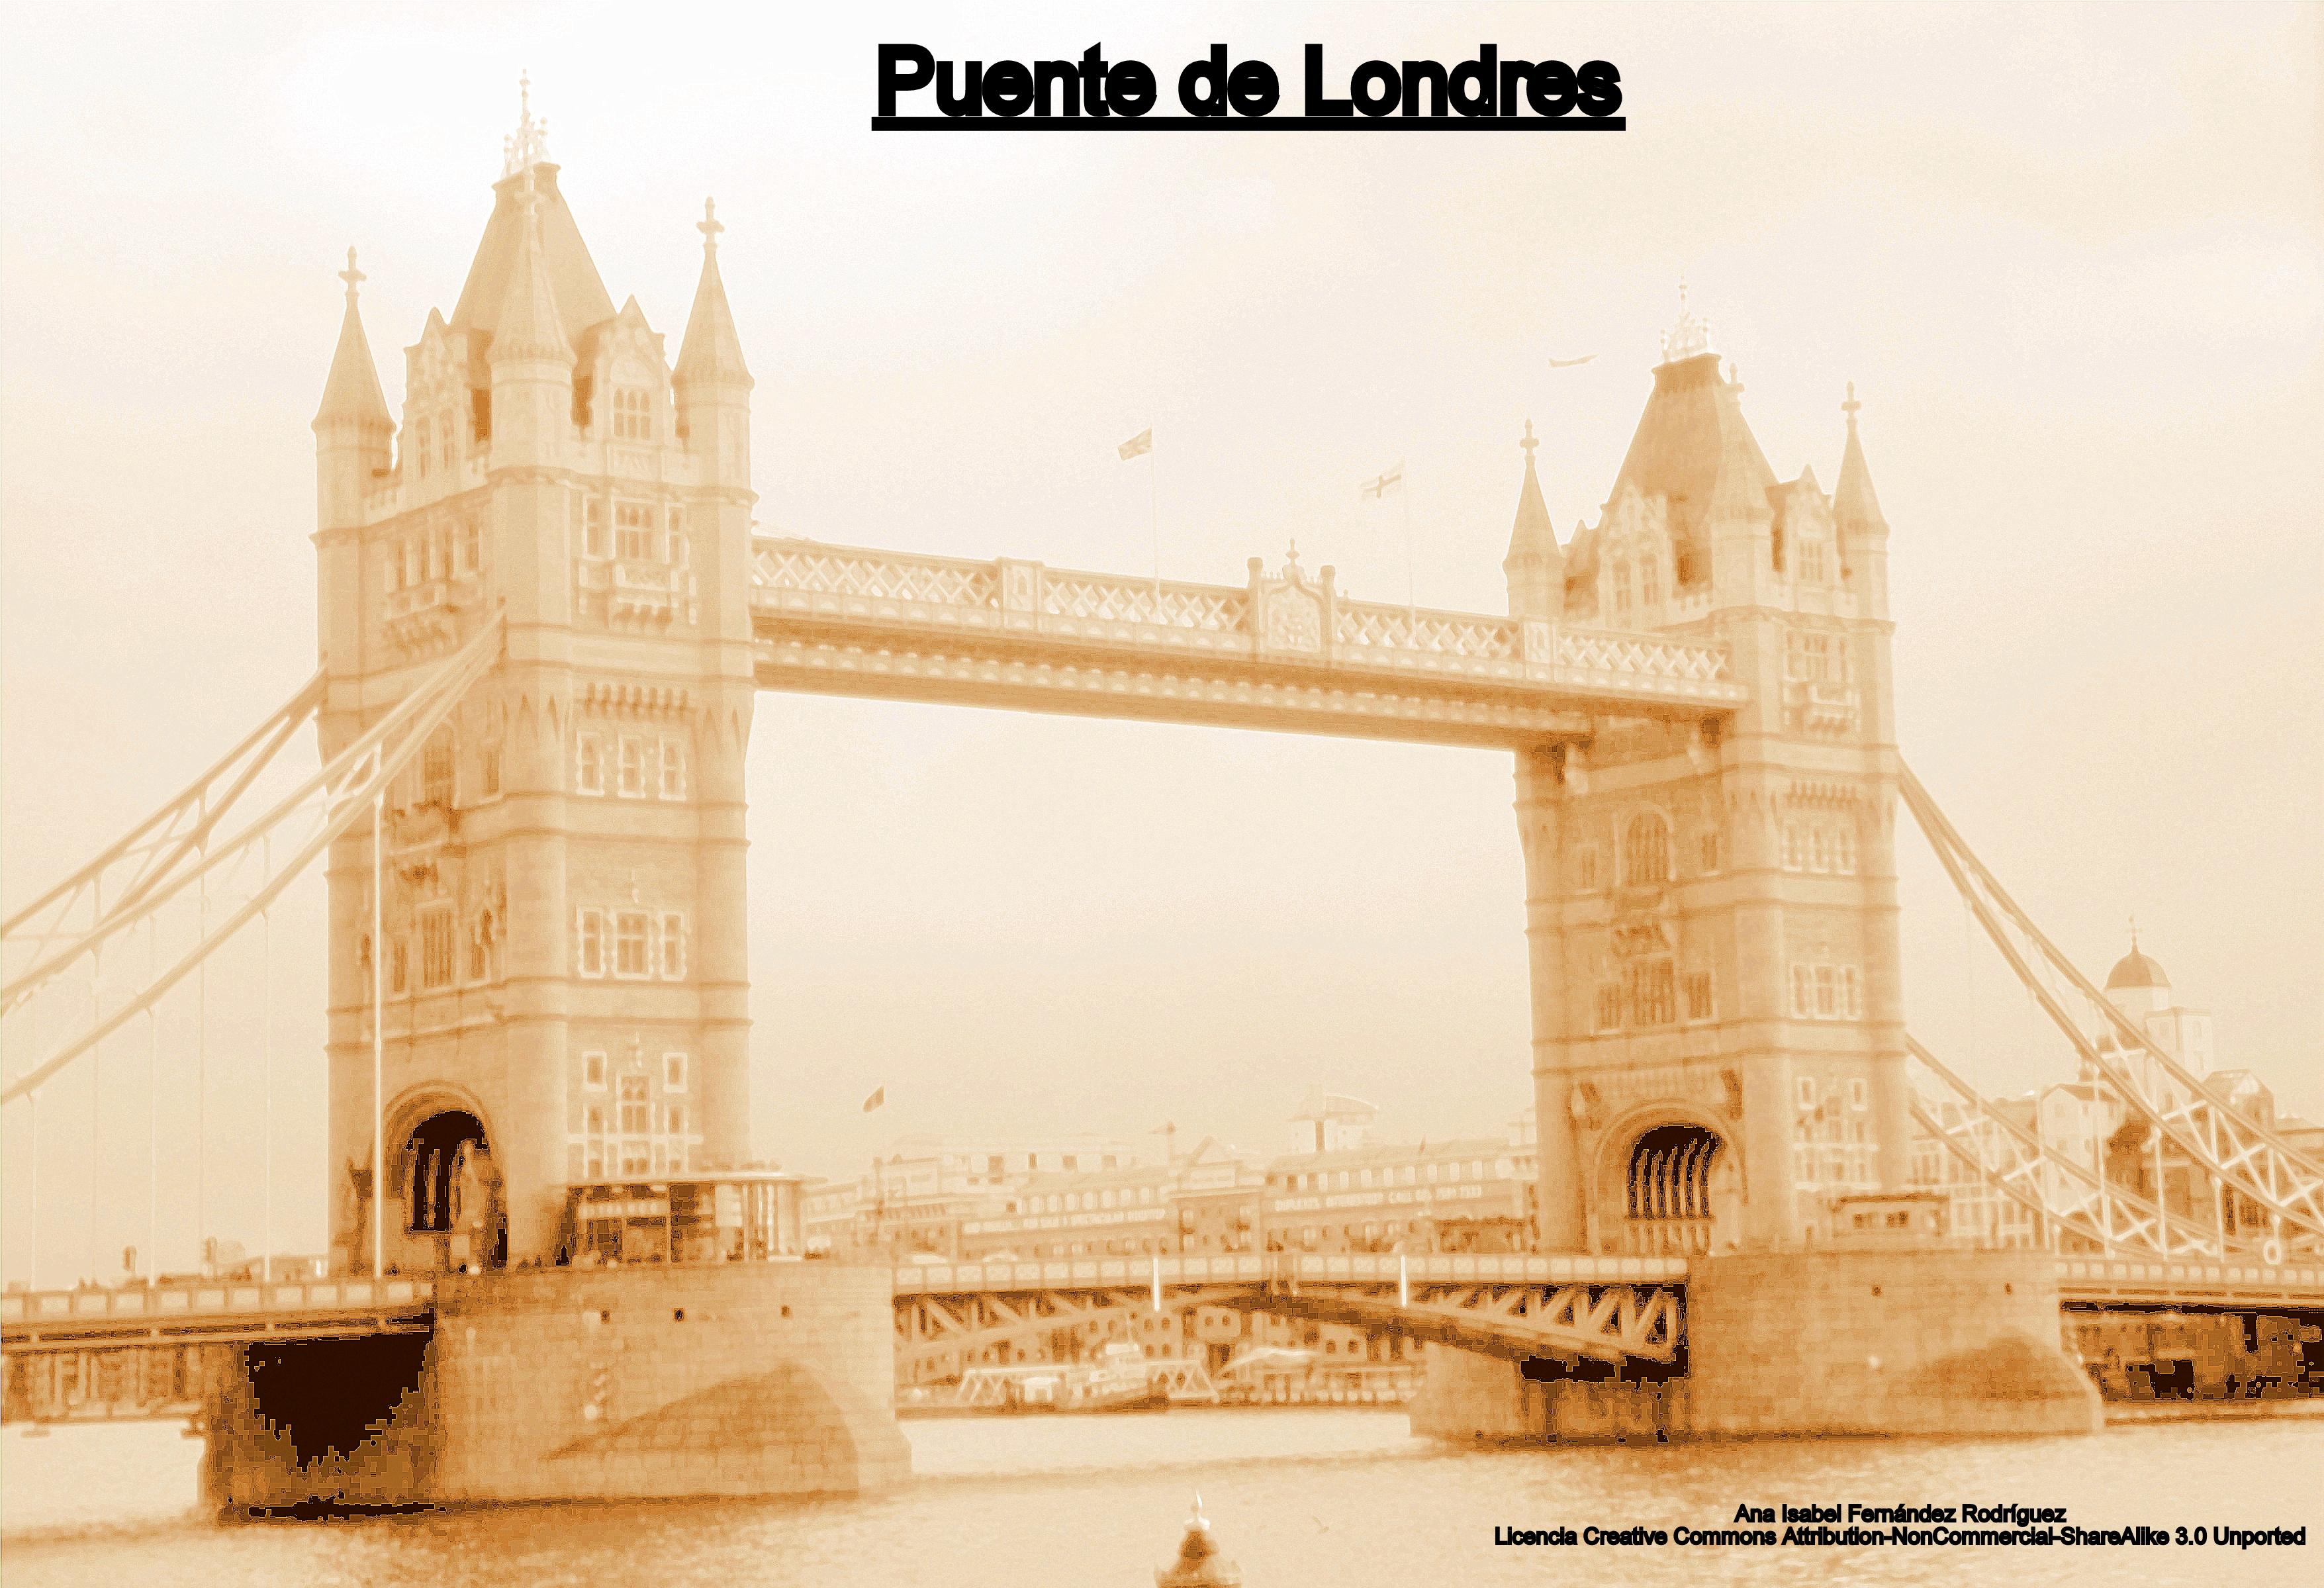 Puente de Londres 2